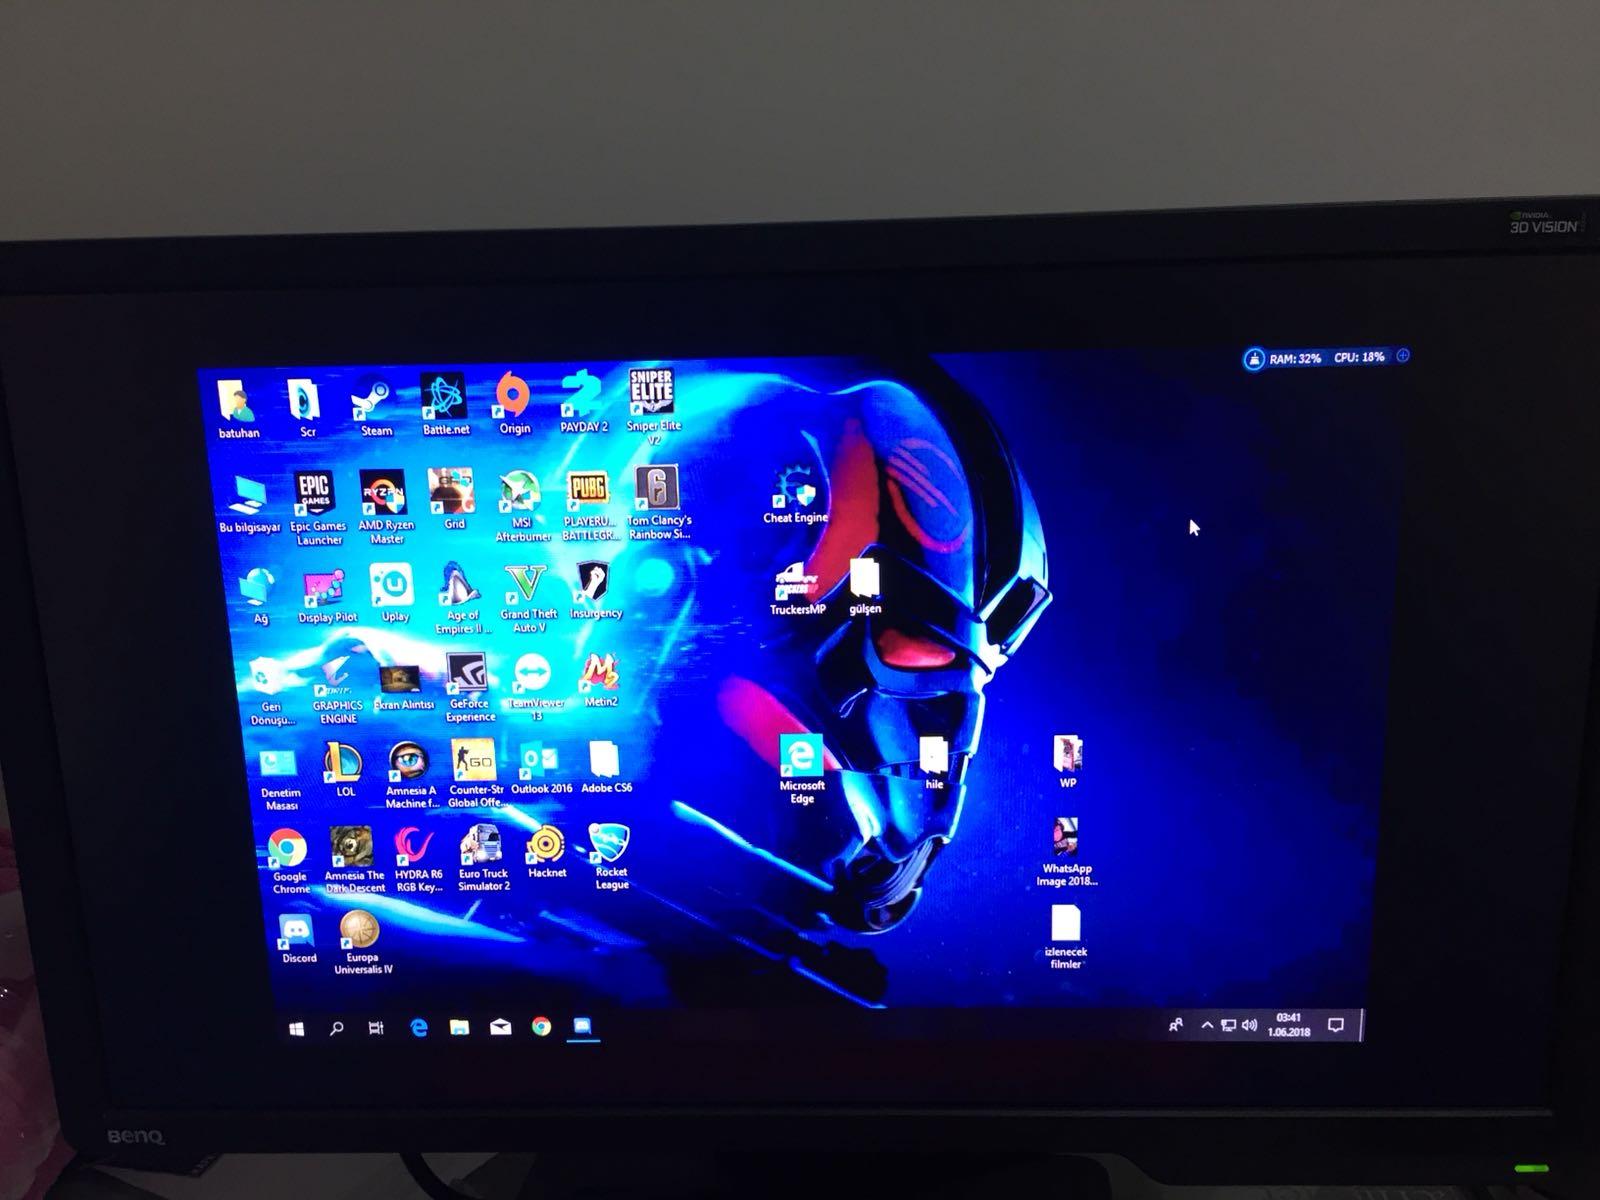 BenQ XL2411z 144 Hz'de ekran kararma sorunu - Technopat Sosyal